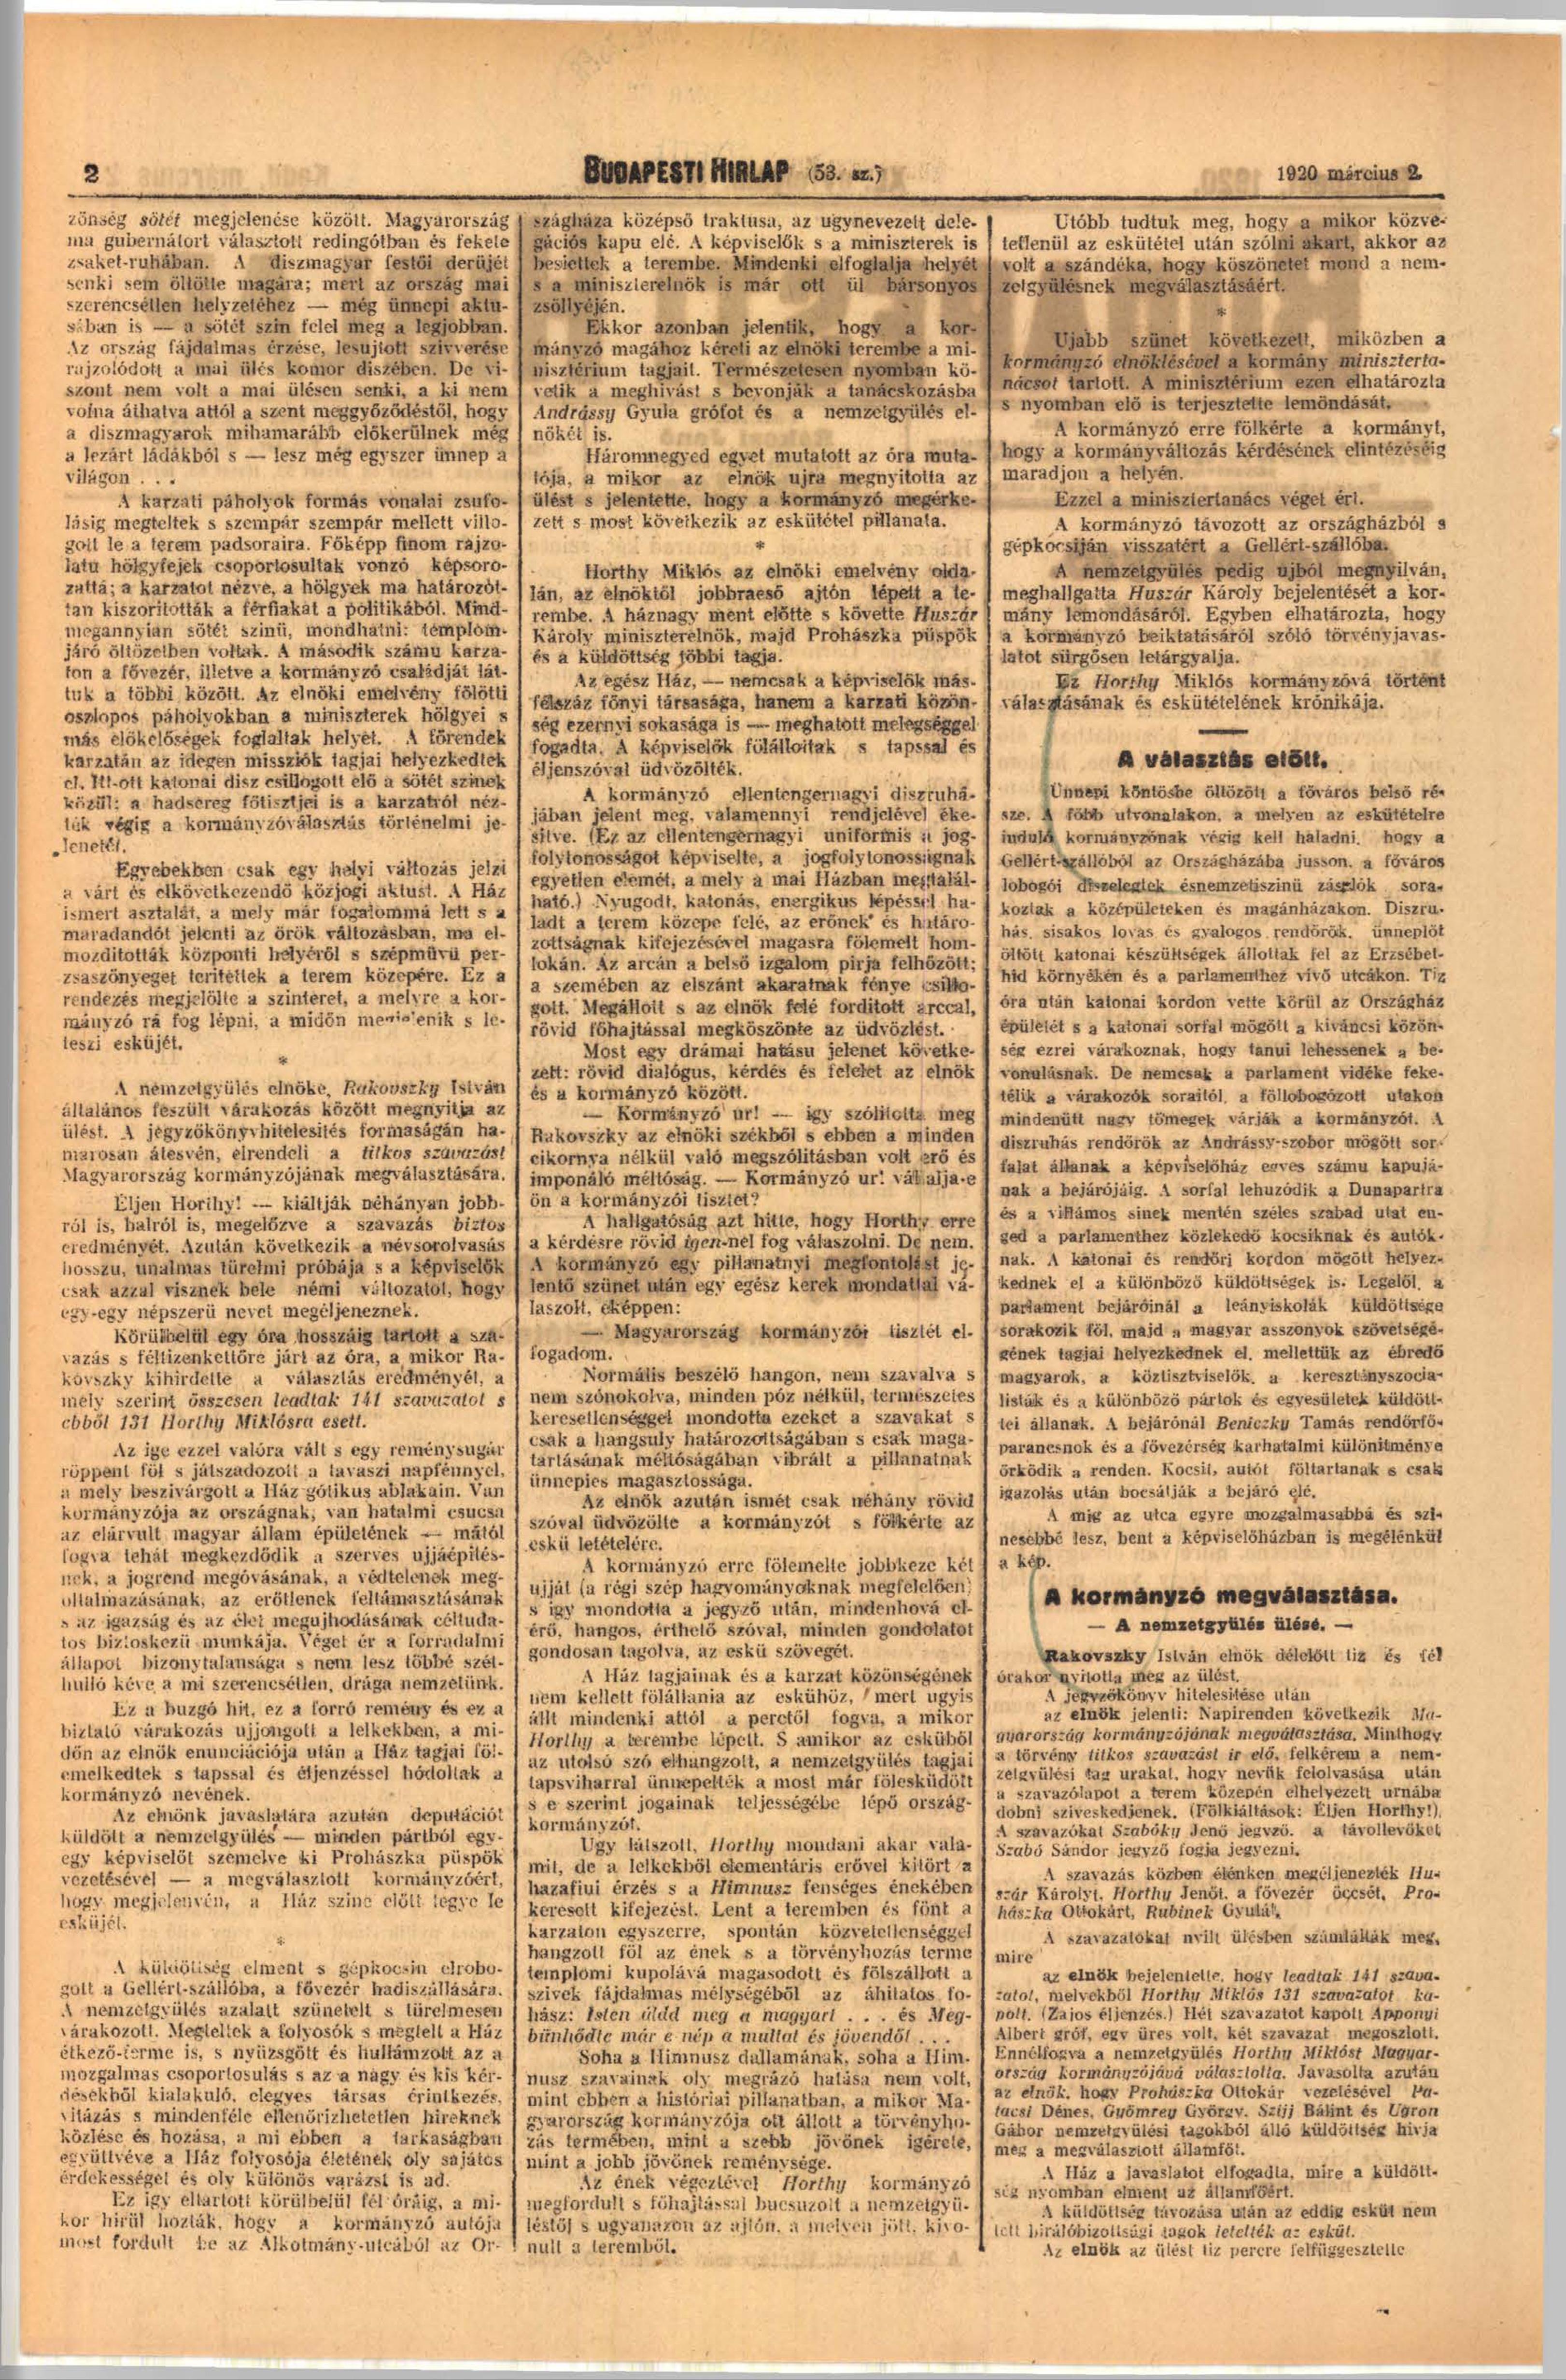 budapestihirlap_1920_03_pages0-2-page-1.jpg